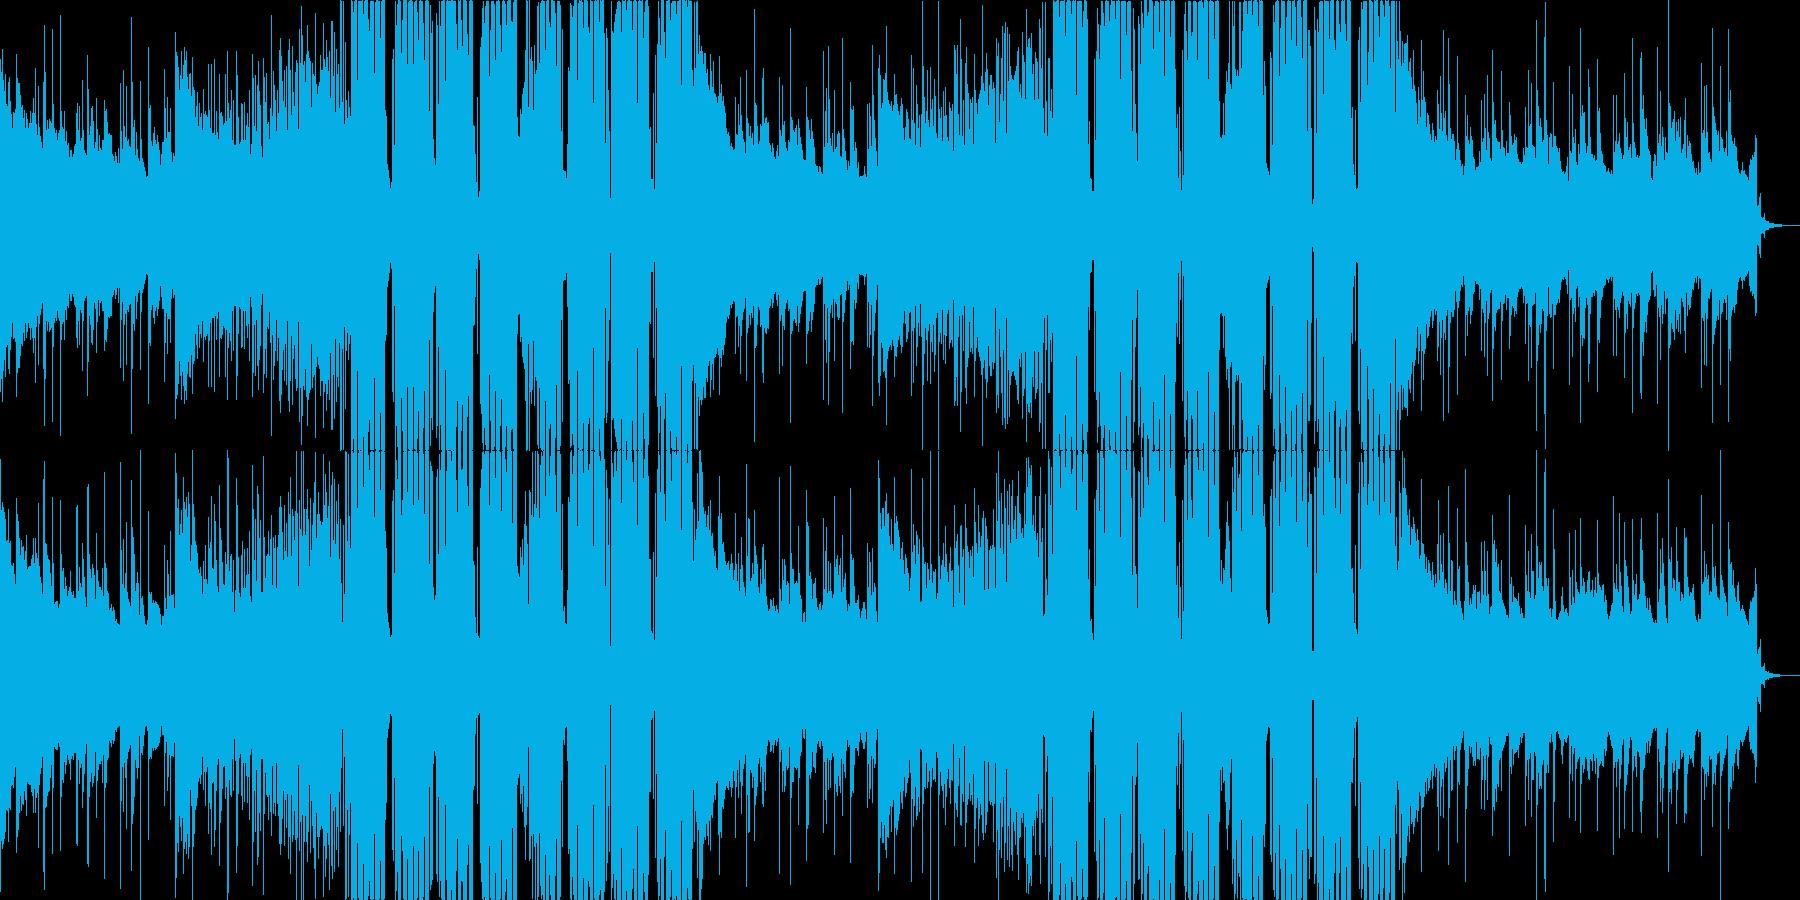 FutureBass3、洋楽、爽快、夏aの再生済みの波形